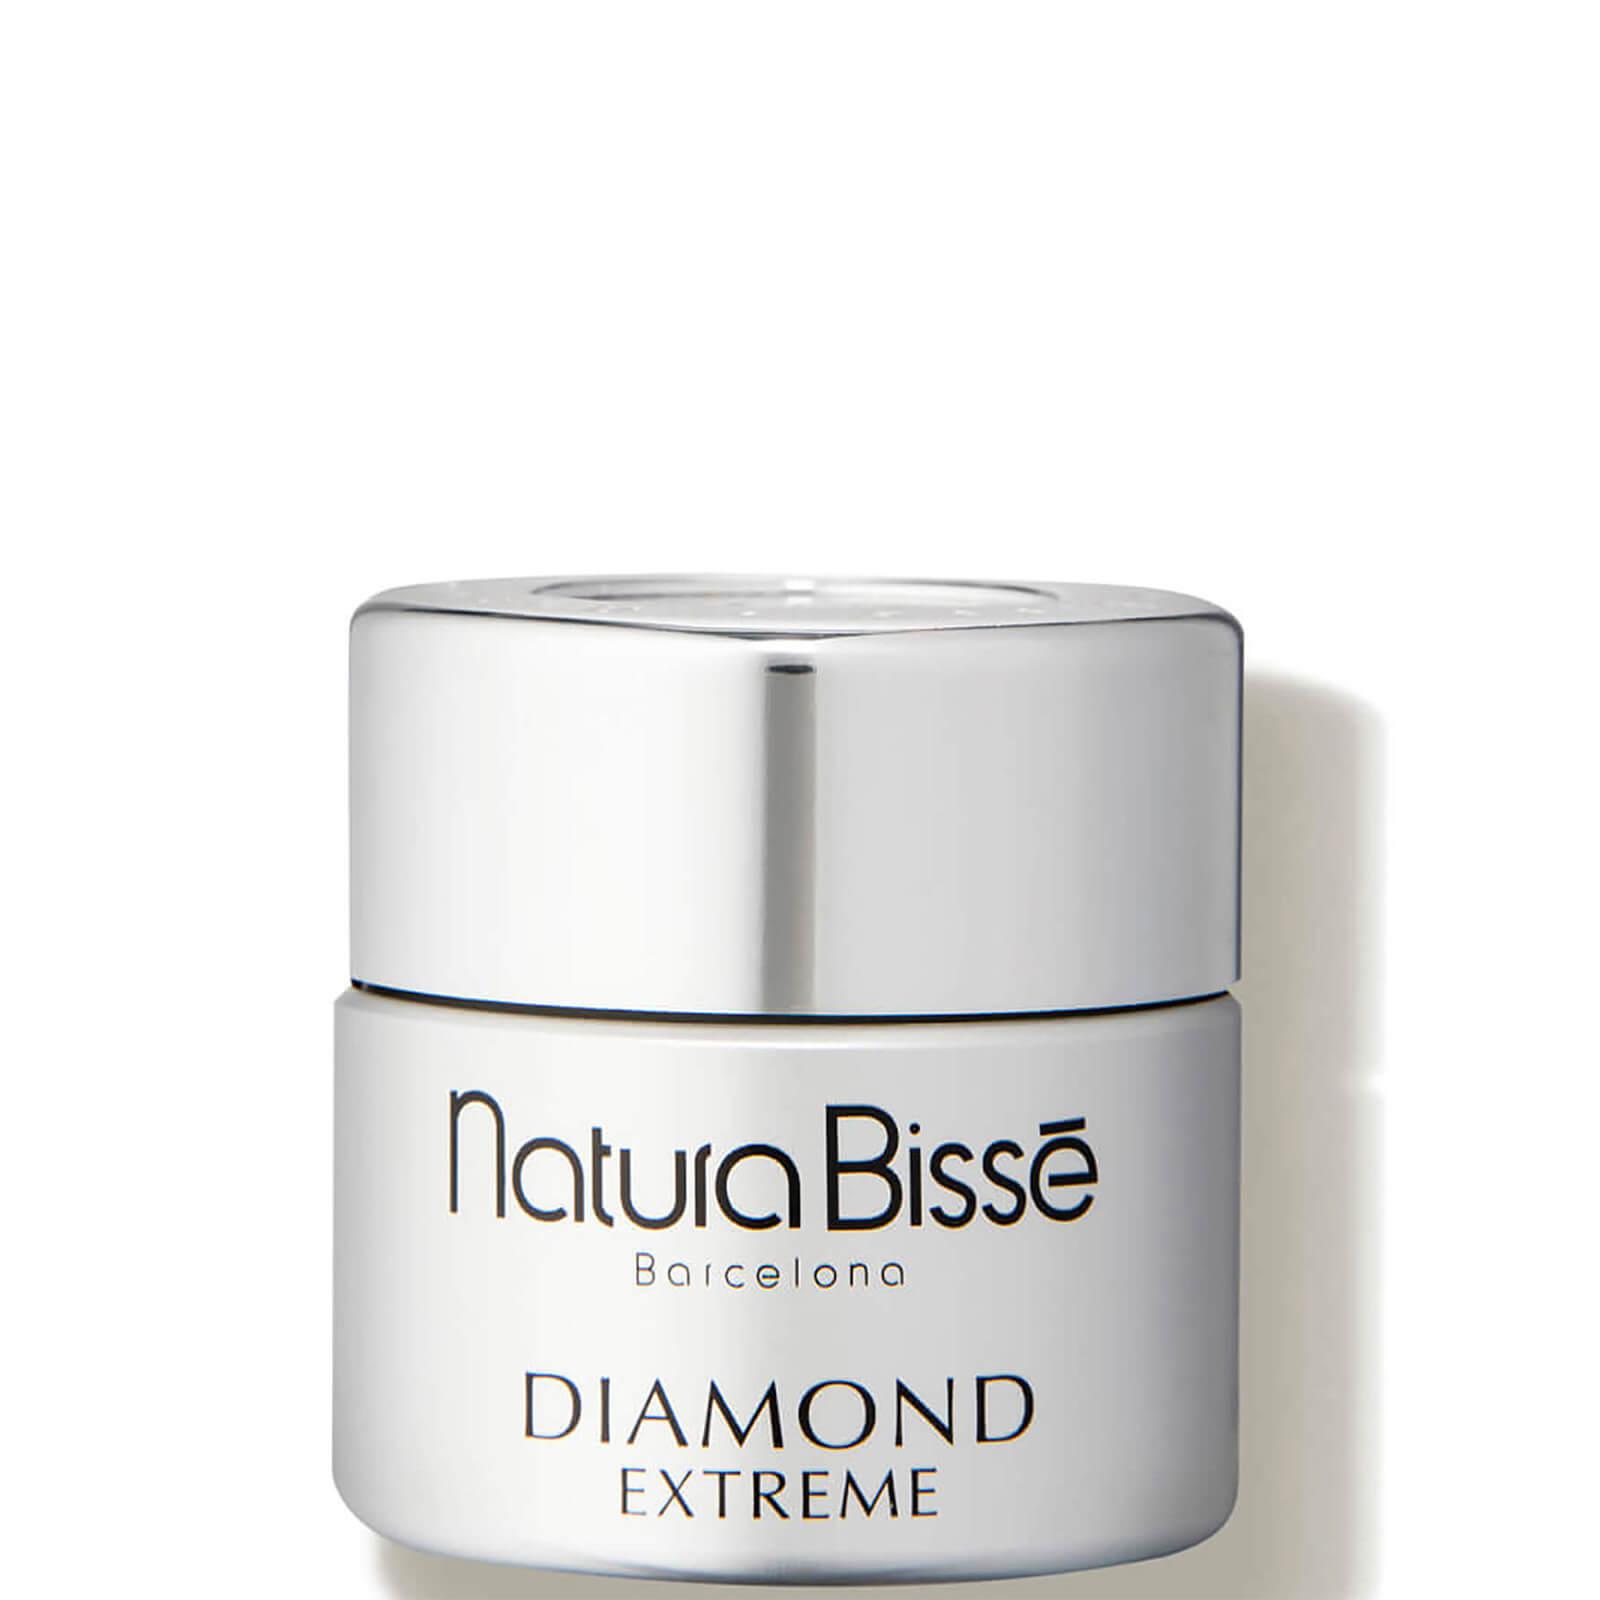 Купить Natura Bissé Diamond Extreme Moisturiser 50ml